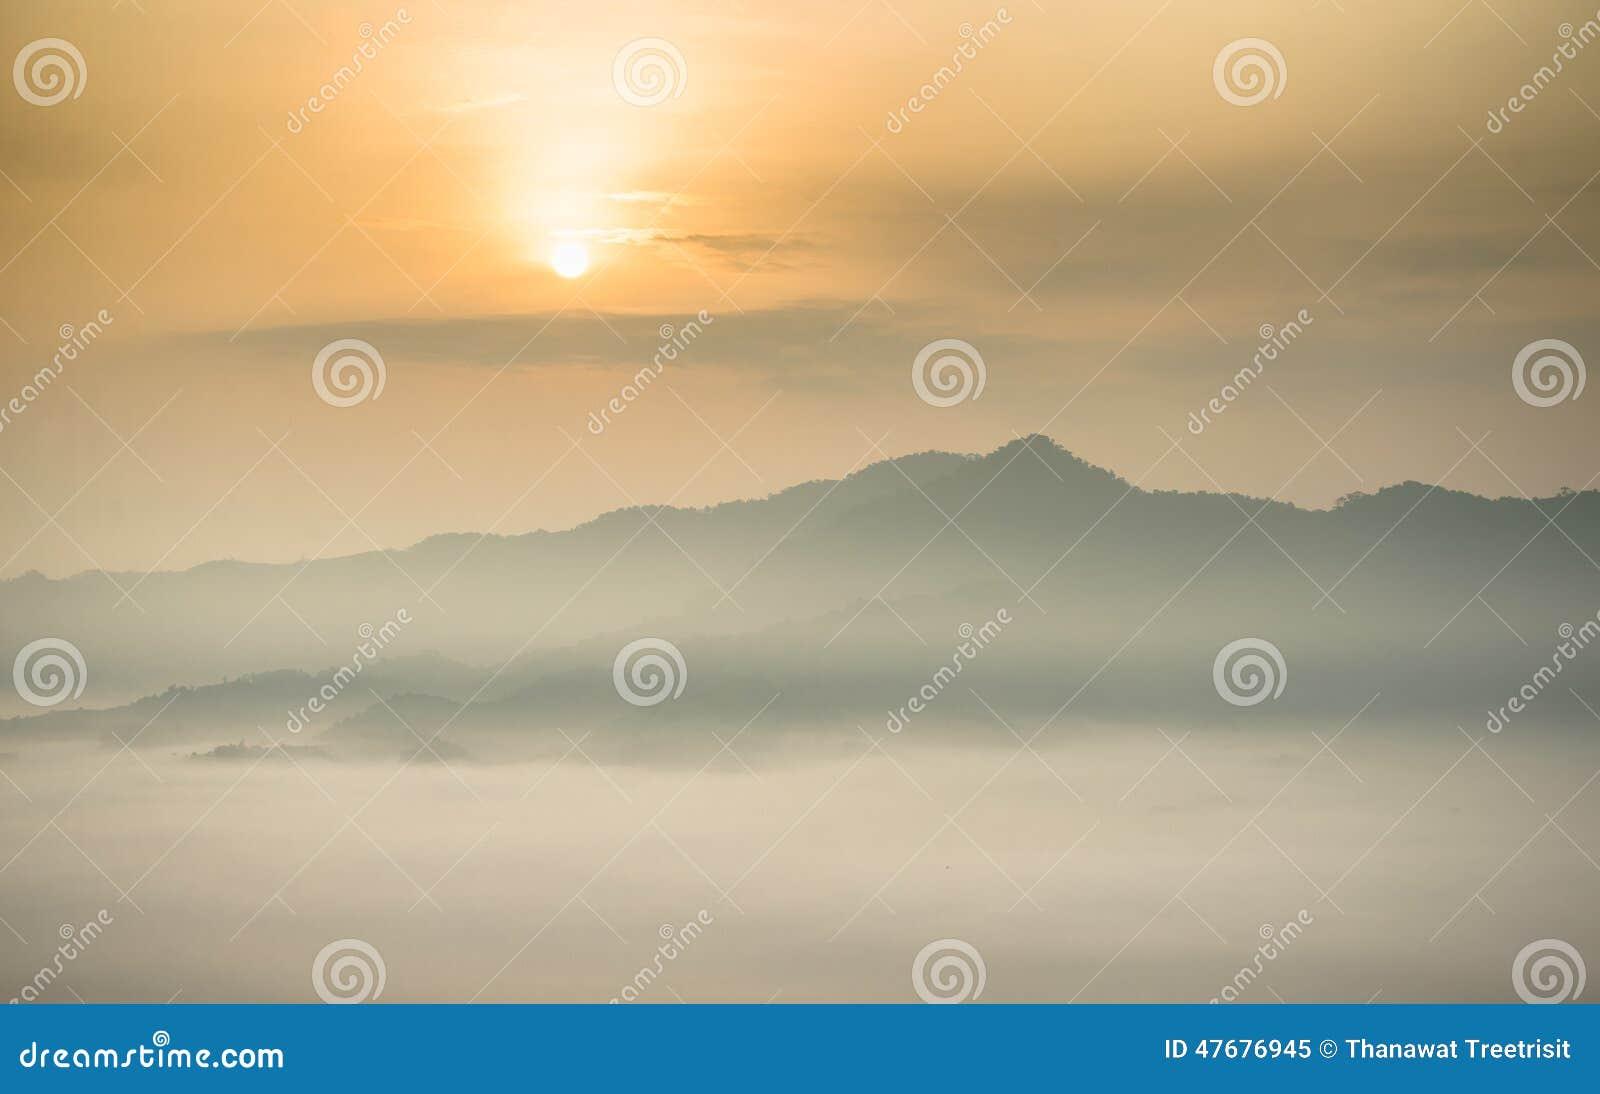 Morgennebel bei Phu Lang Ka, Thailand